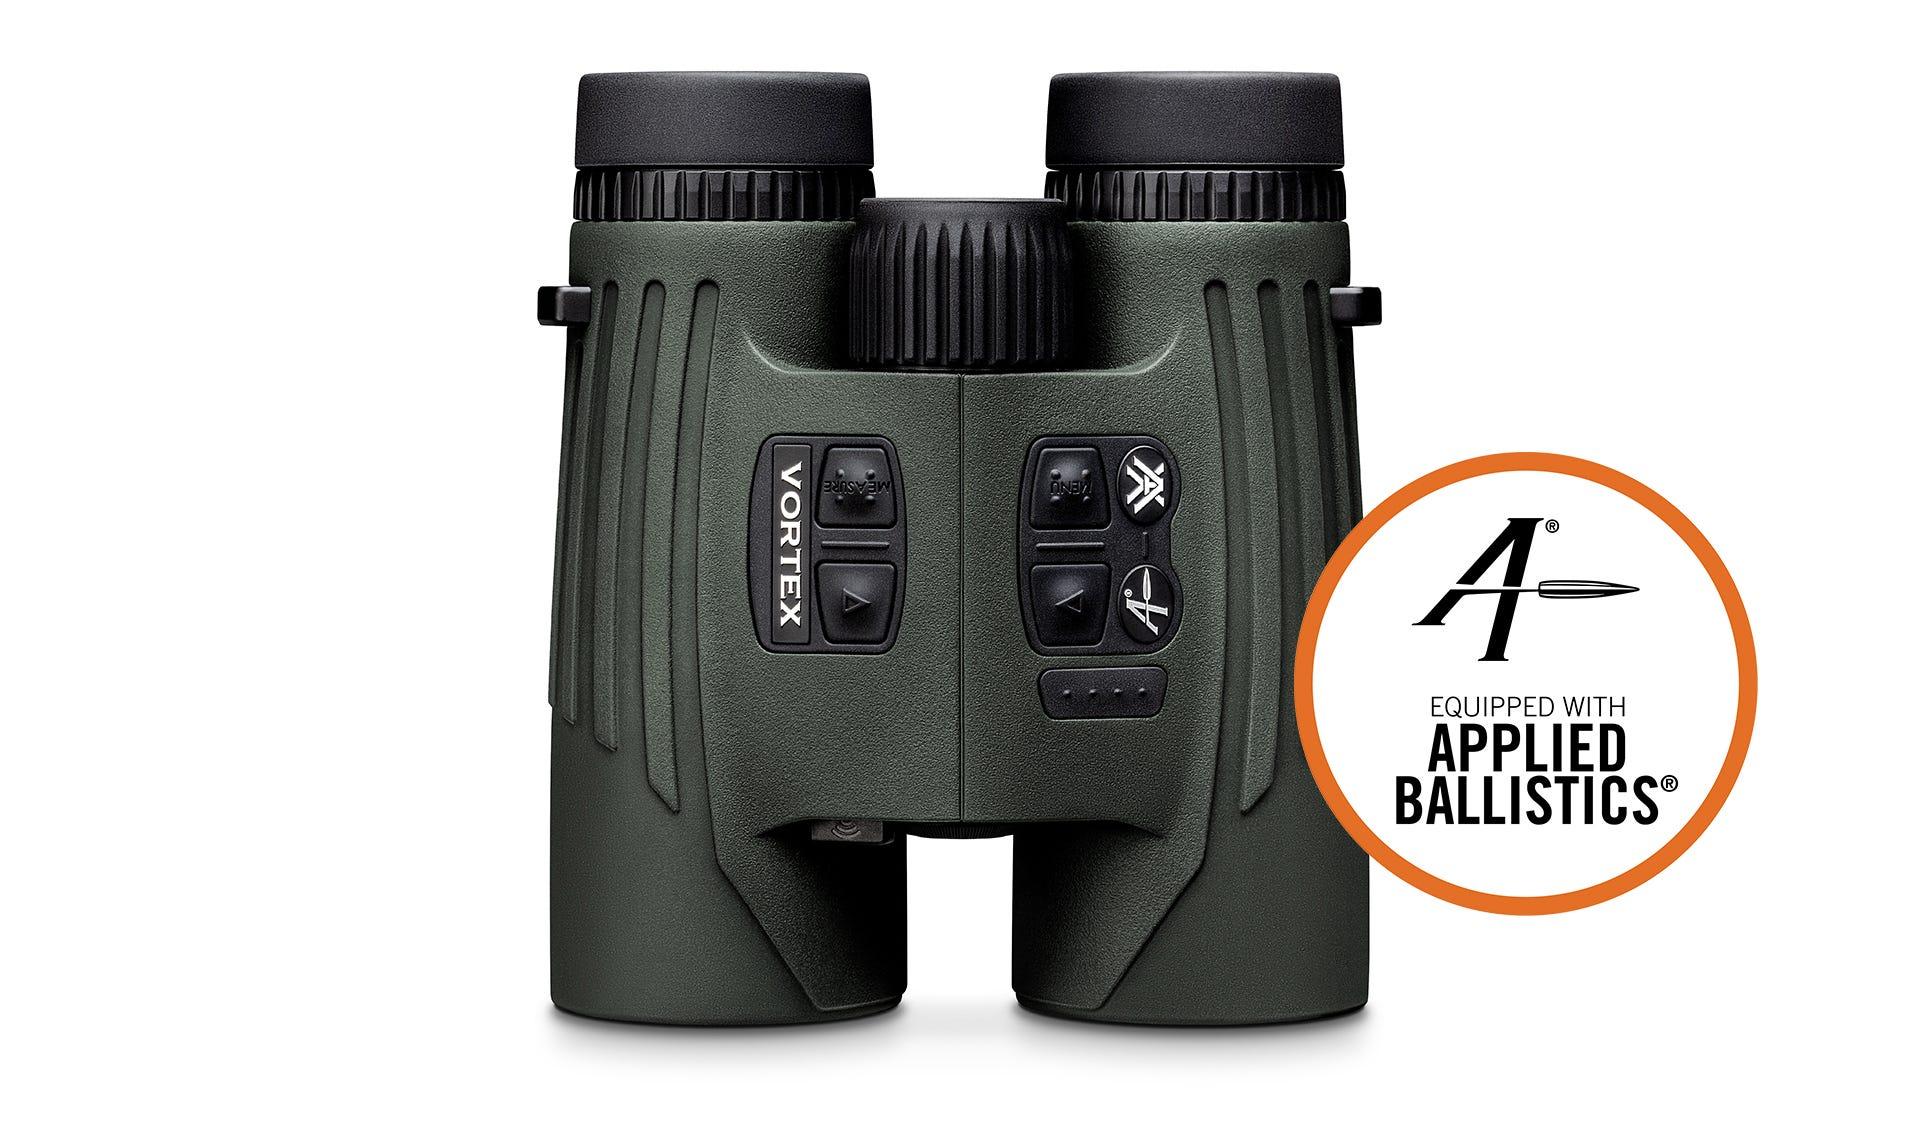 VORTEX Rangefinder / Binocular Fury HD 5000 AB